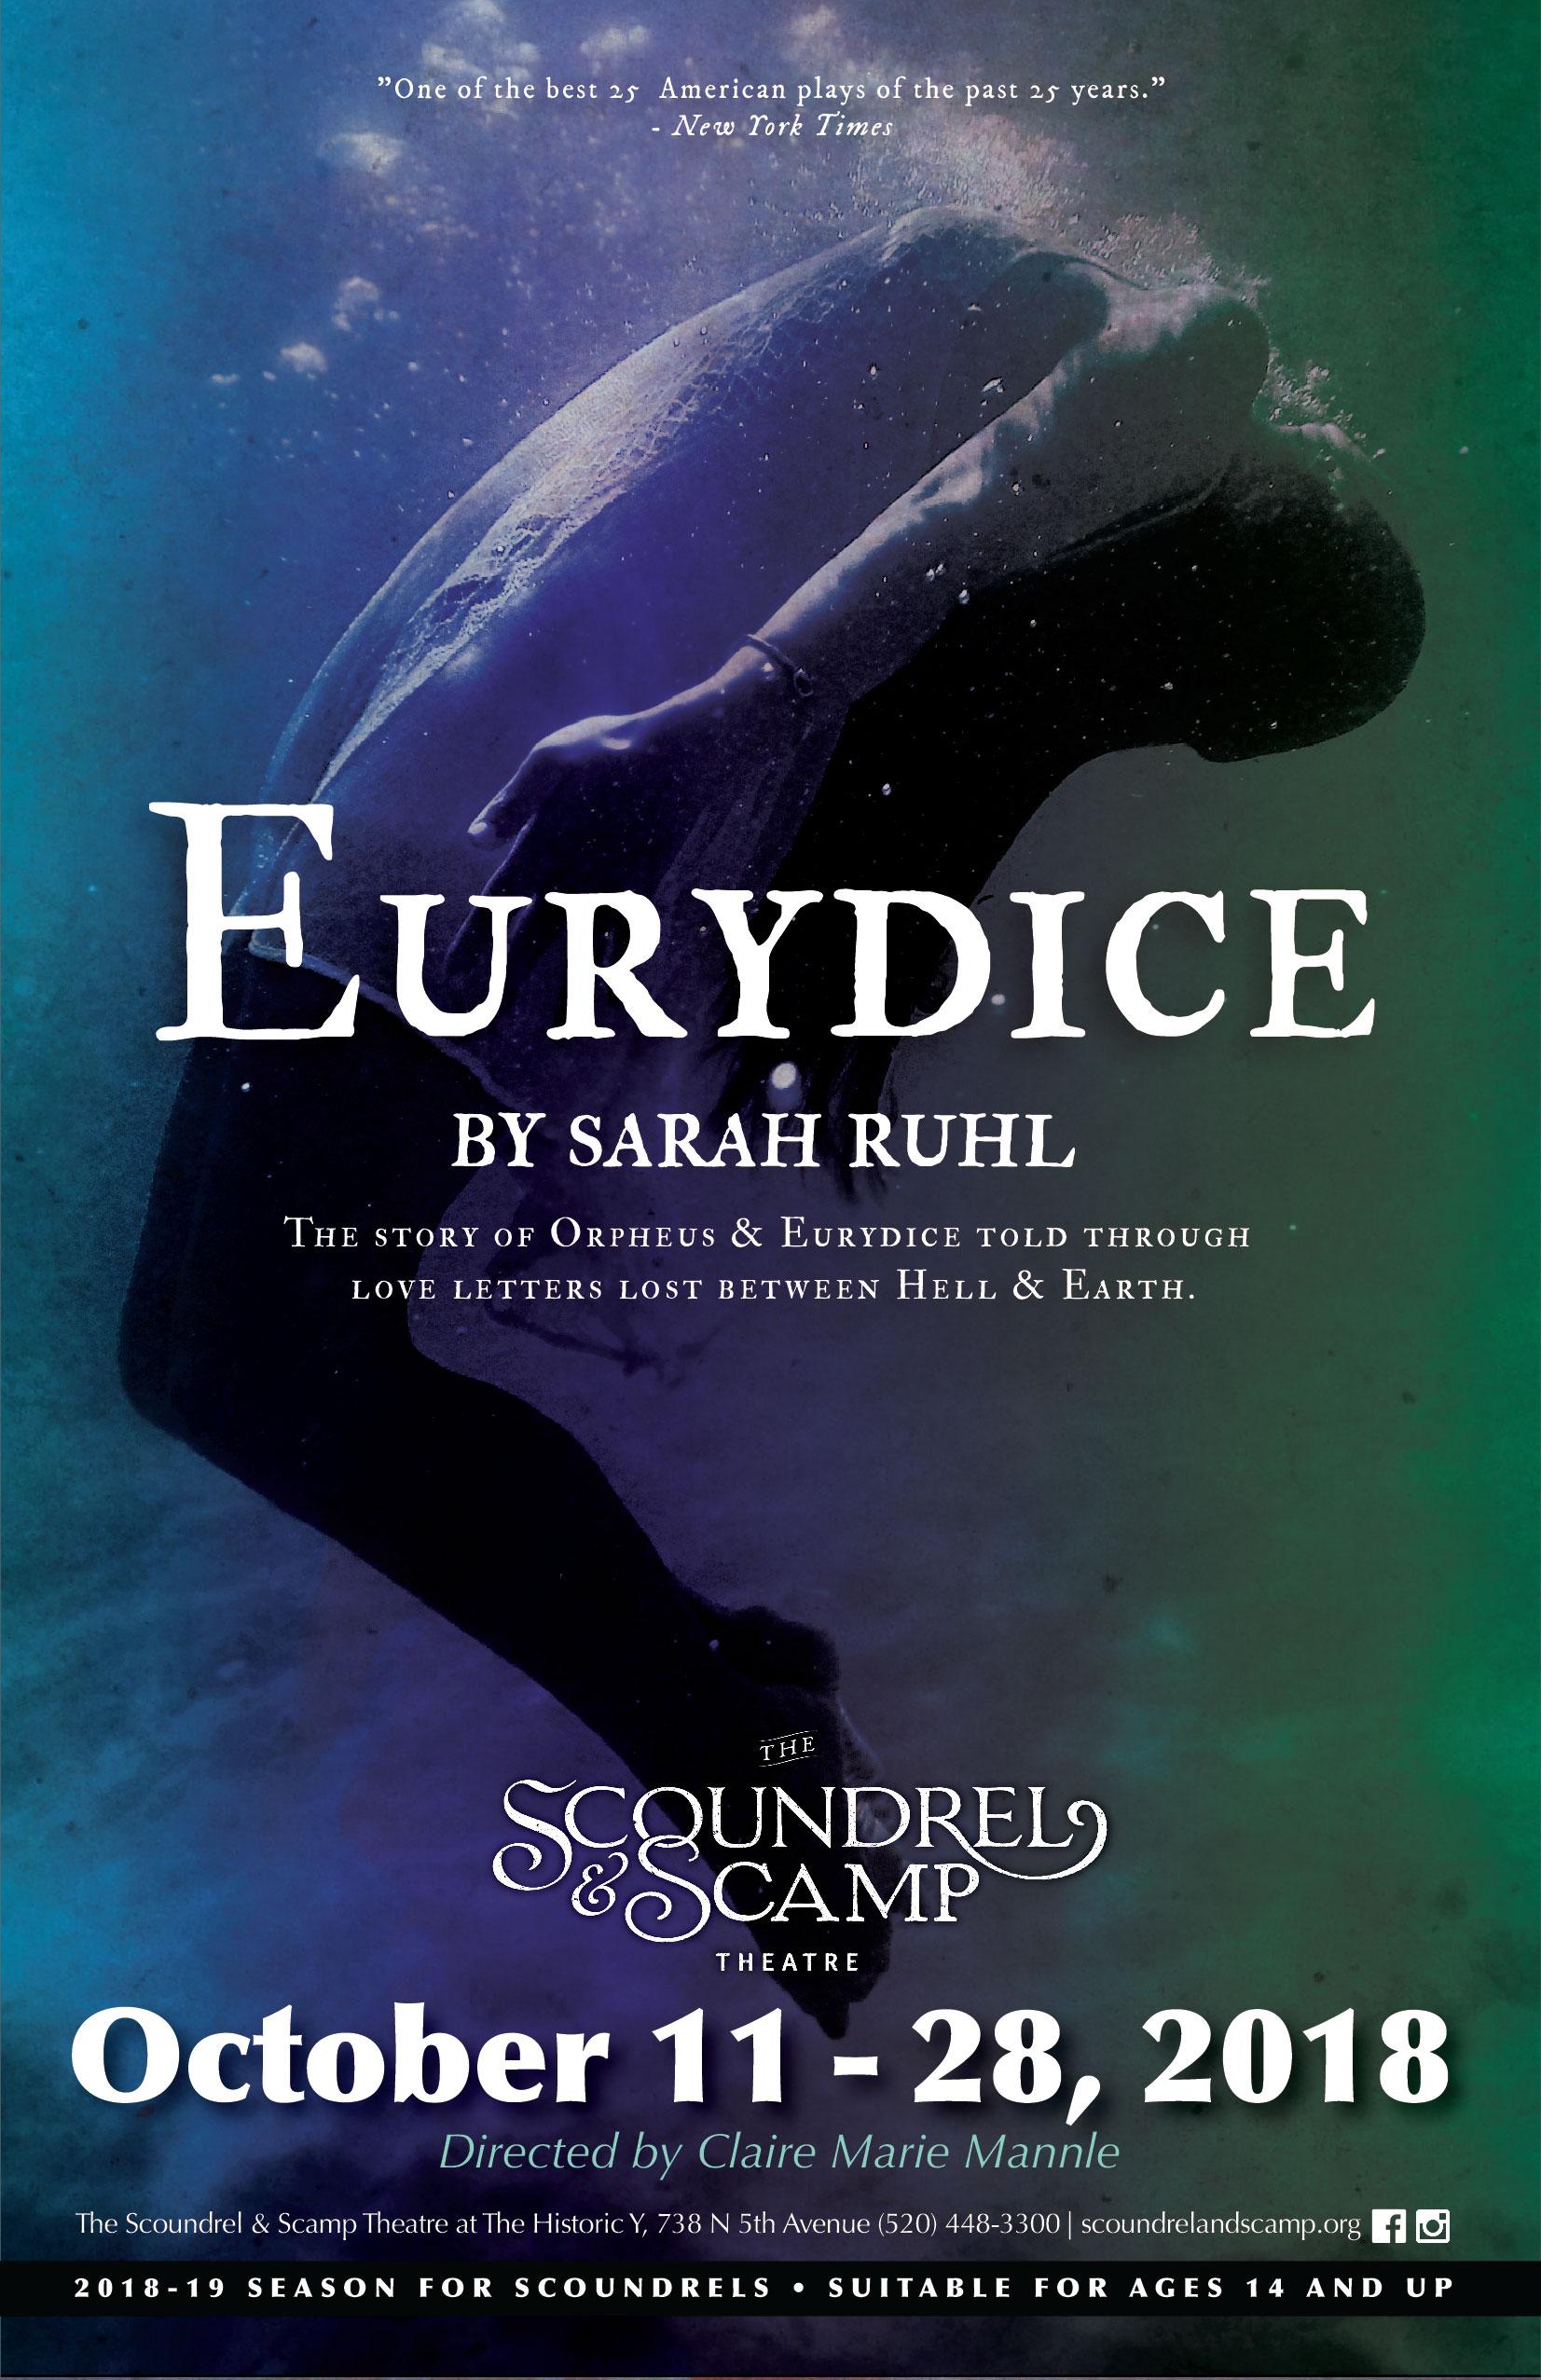 Eurydice-NEW-draft-01.jpg